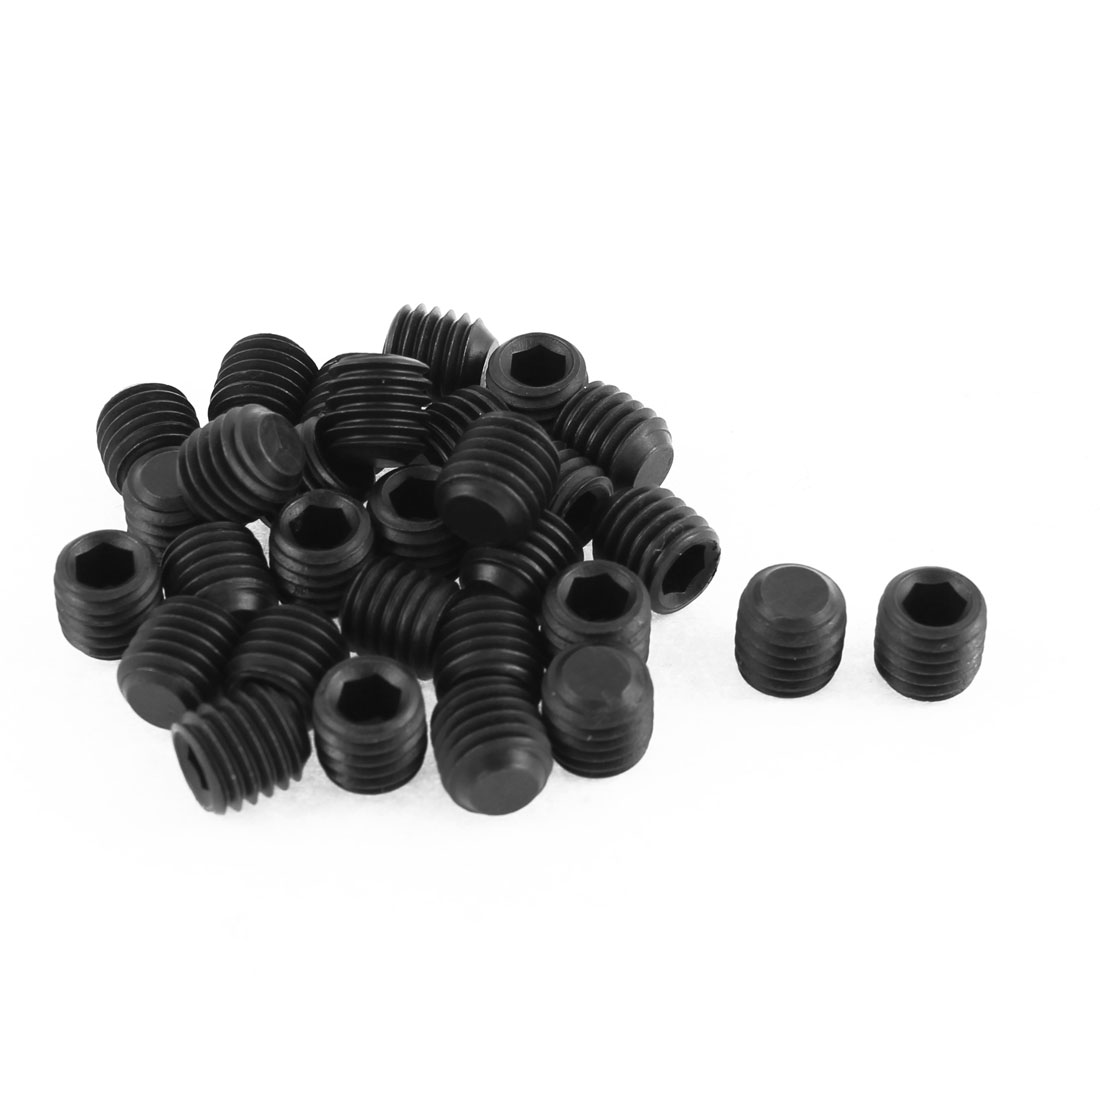 M10x1.5mm Pitch 12.9 Alloy Steel Hex Socket Set Cap Point Grub Screws Black 30pcs